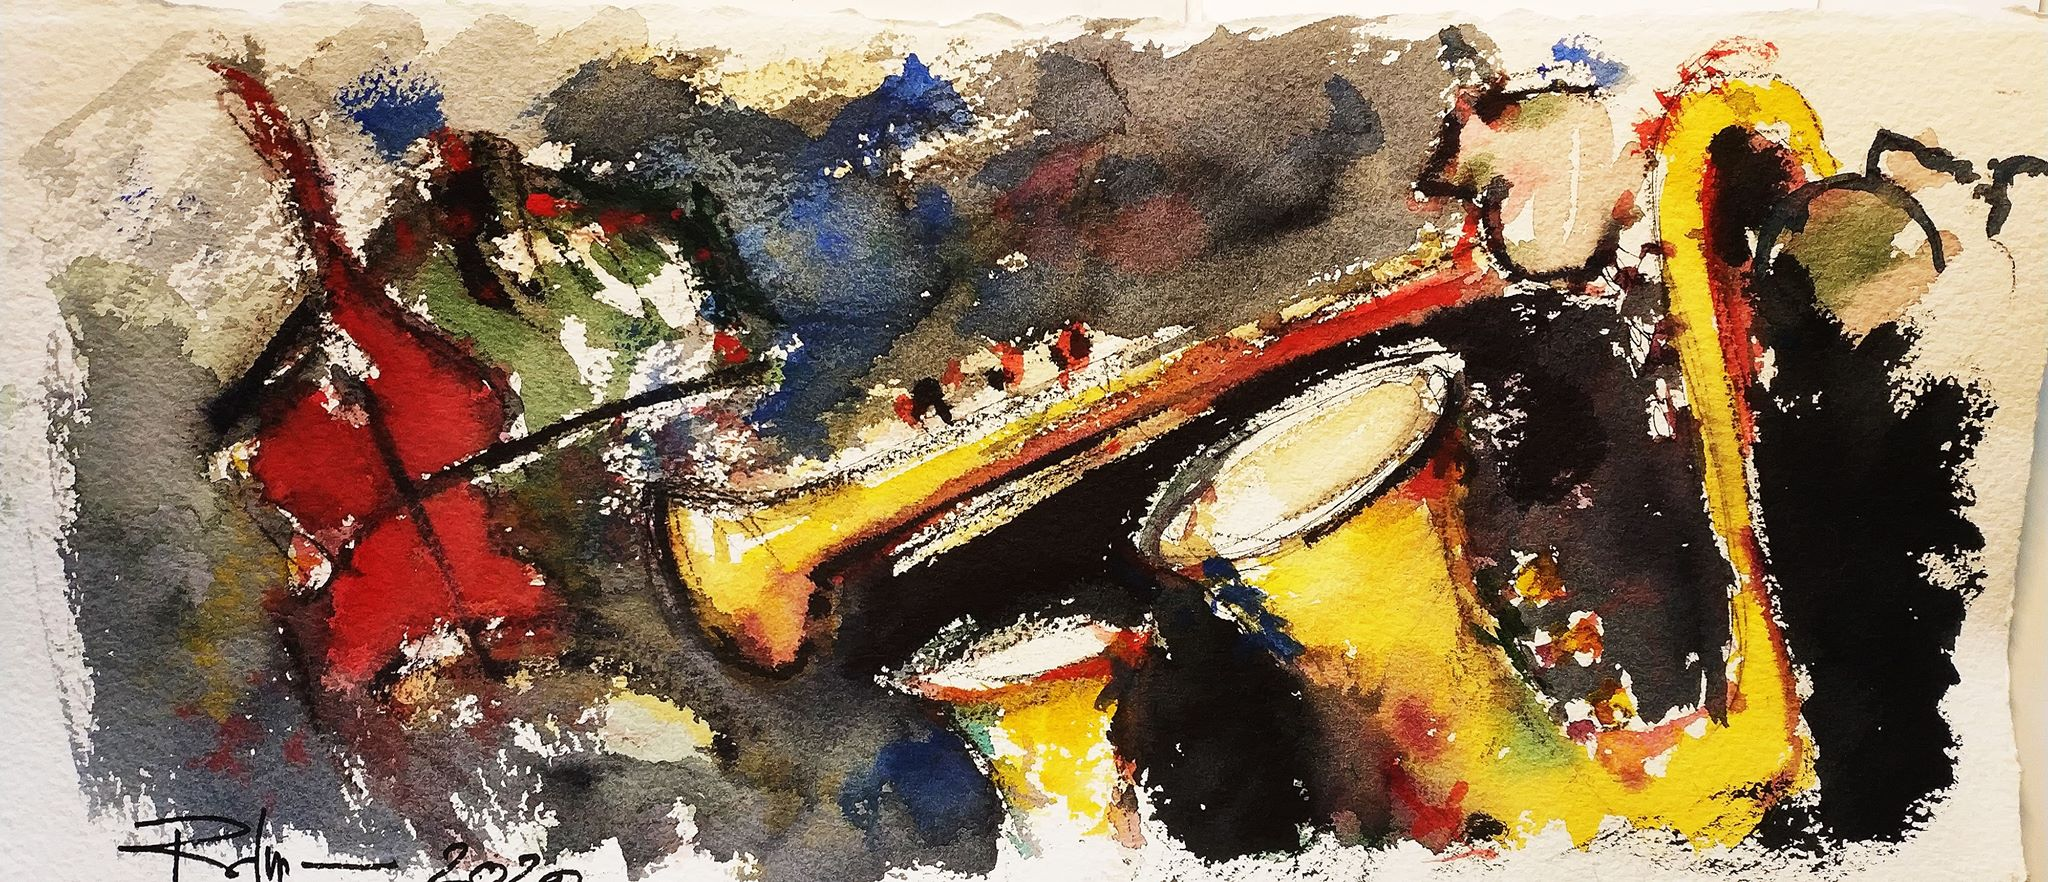 Haïdouks Taraf, 16x38cm watercolour, 2020, 130€